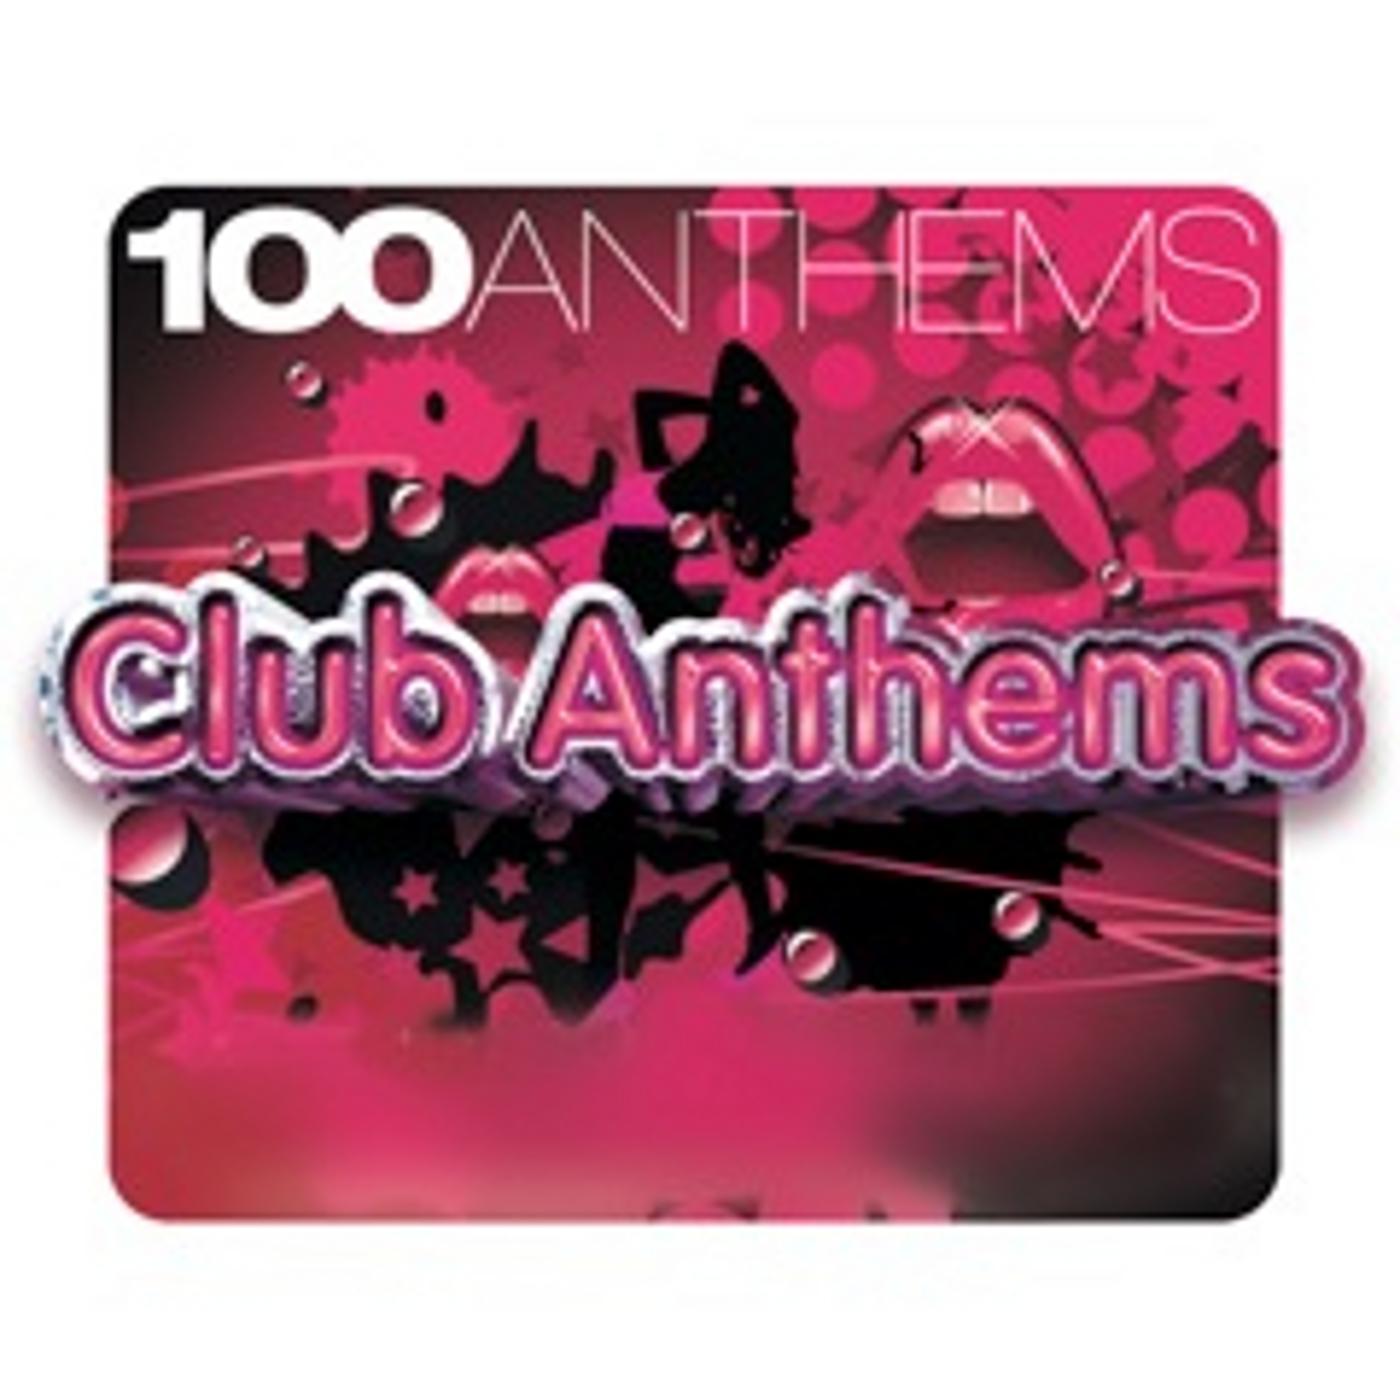 100 Anthems Club Anthems